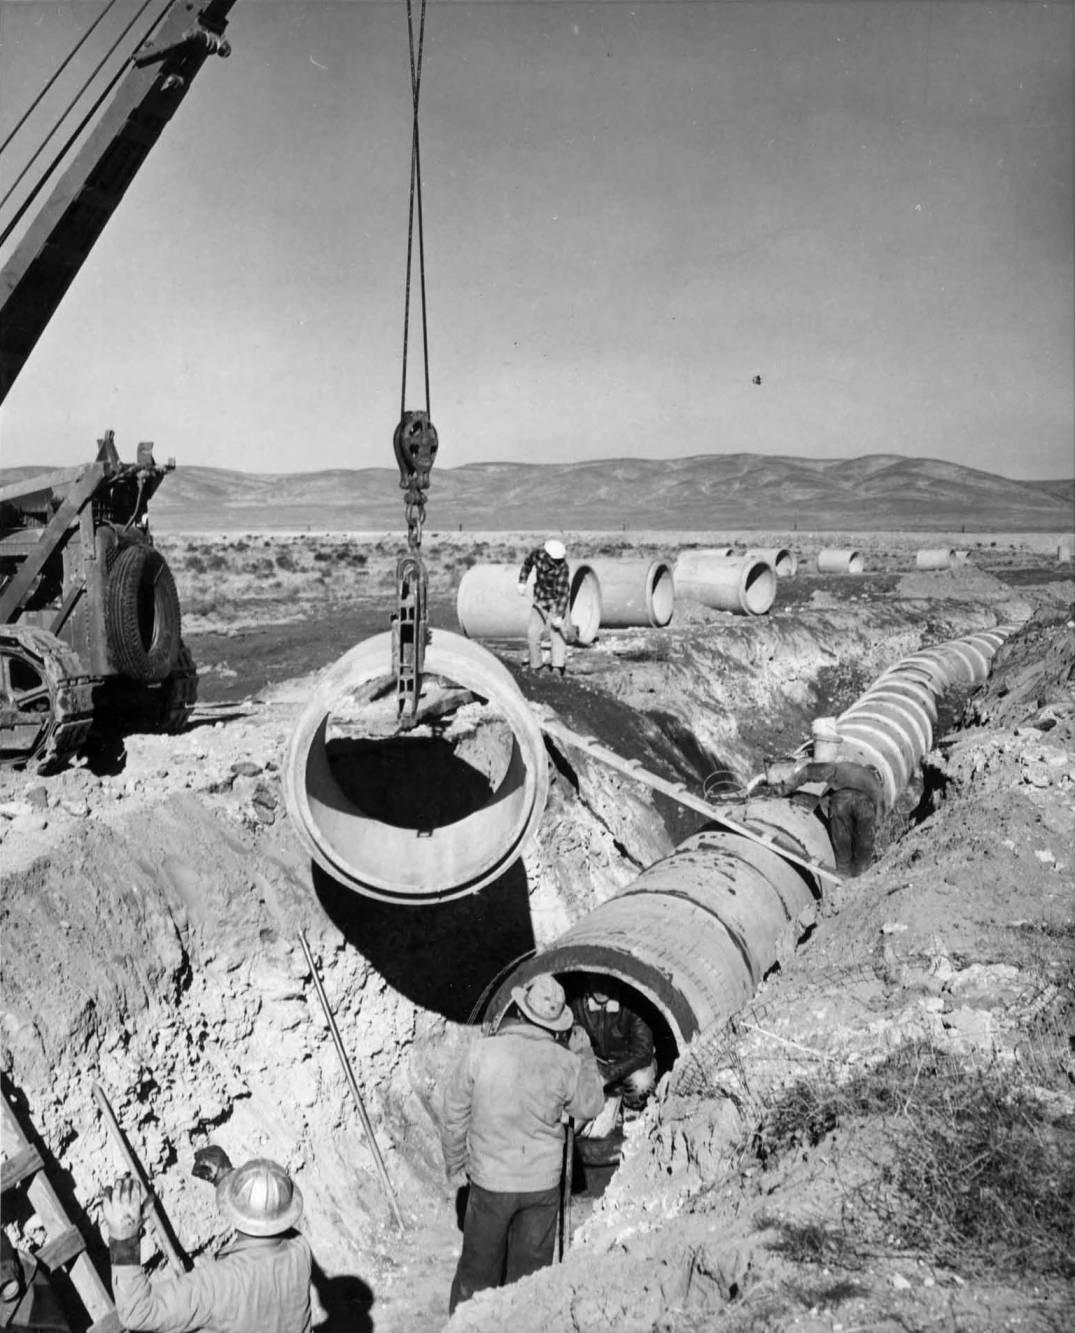 item thumbnail for Workman Installing 42'Pipe [02] (Farm development)